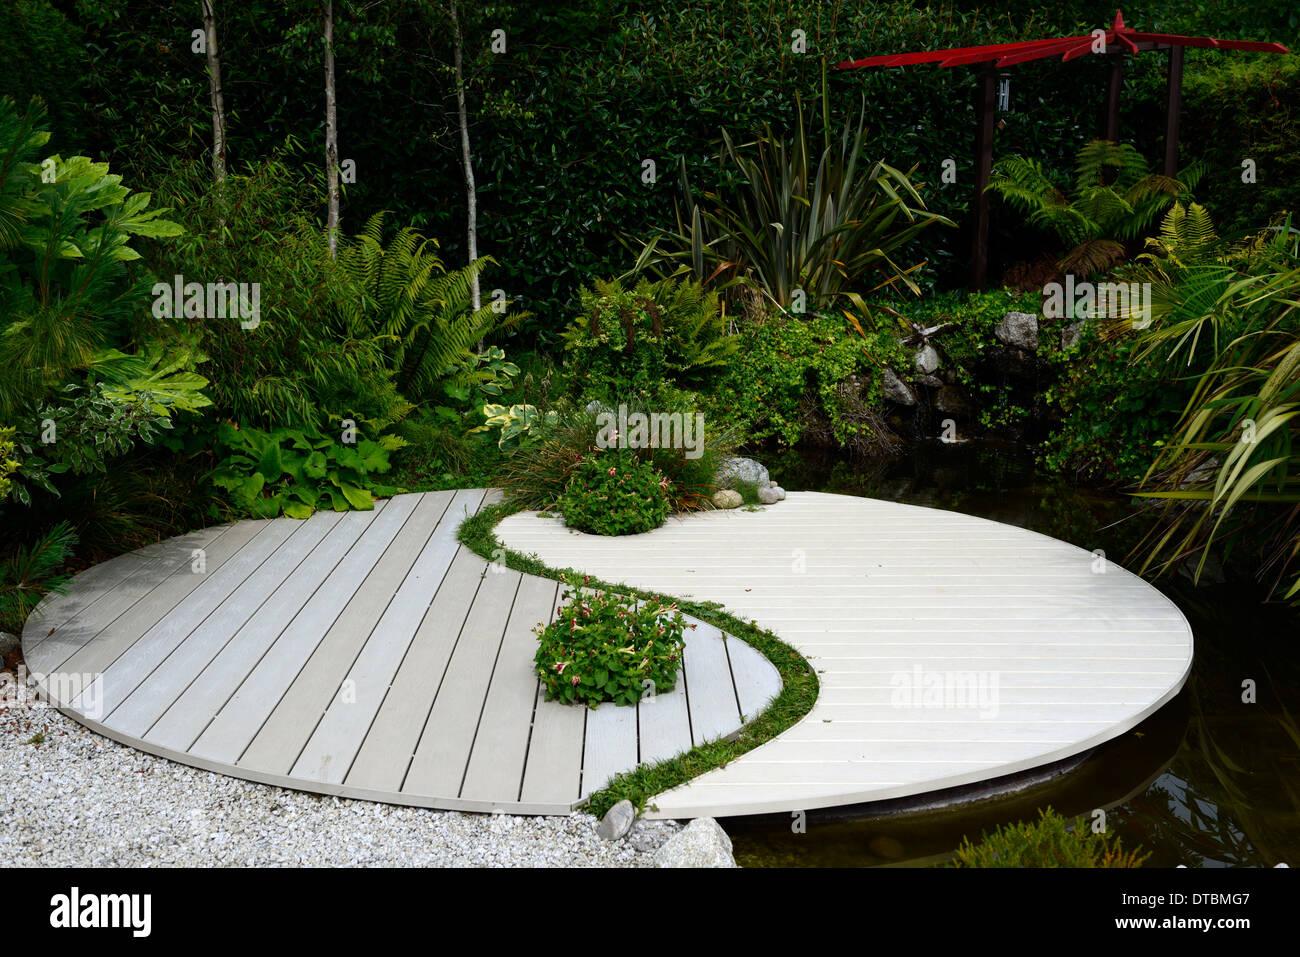 ying yang harmonie symbol feng shui japanischen asiatischen garten anpflanzen schema nationalen. Black Bedroom Furniture Sets. Home Design Ideas